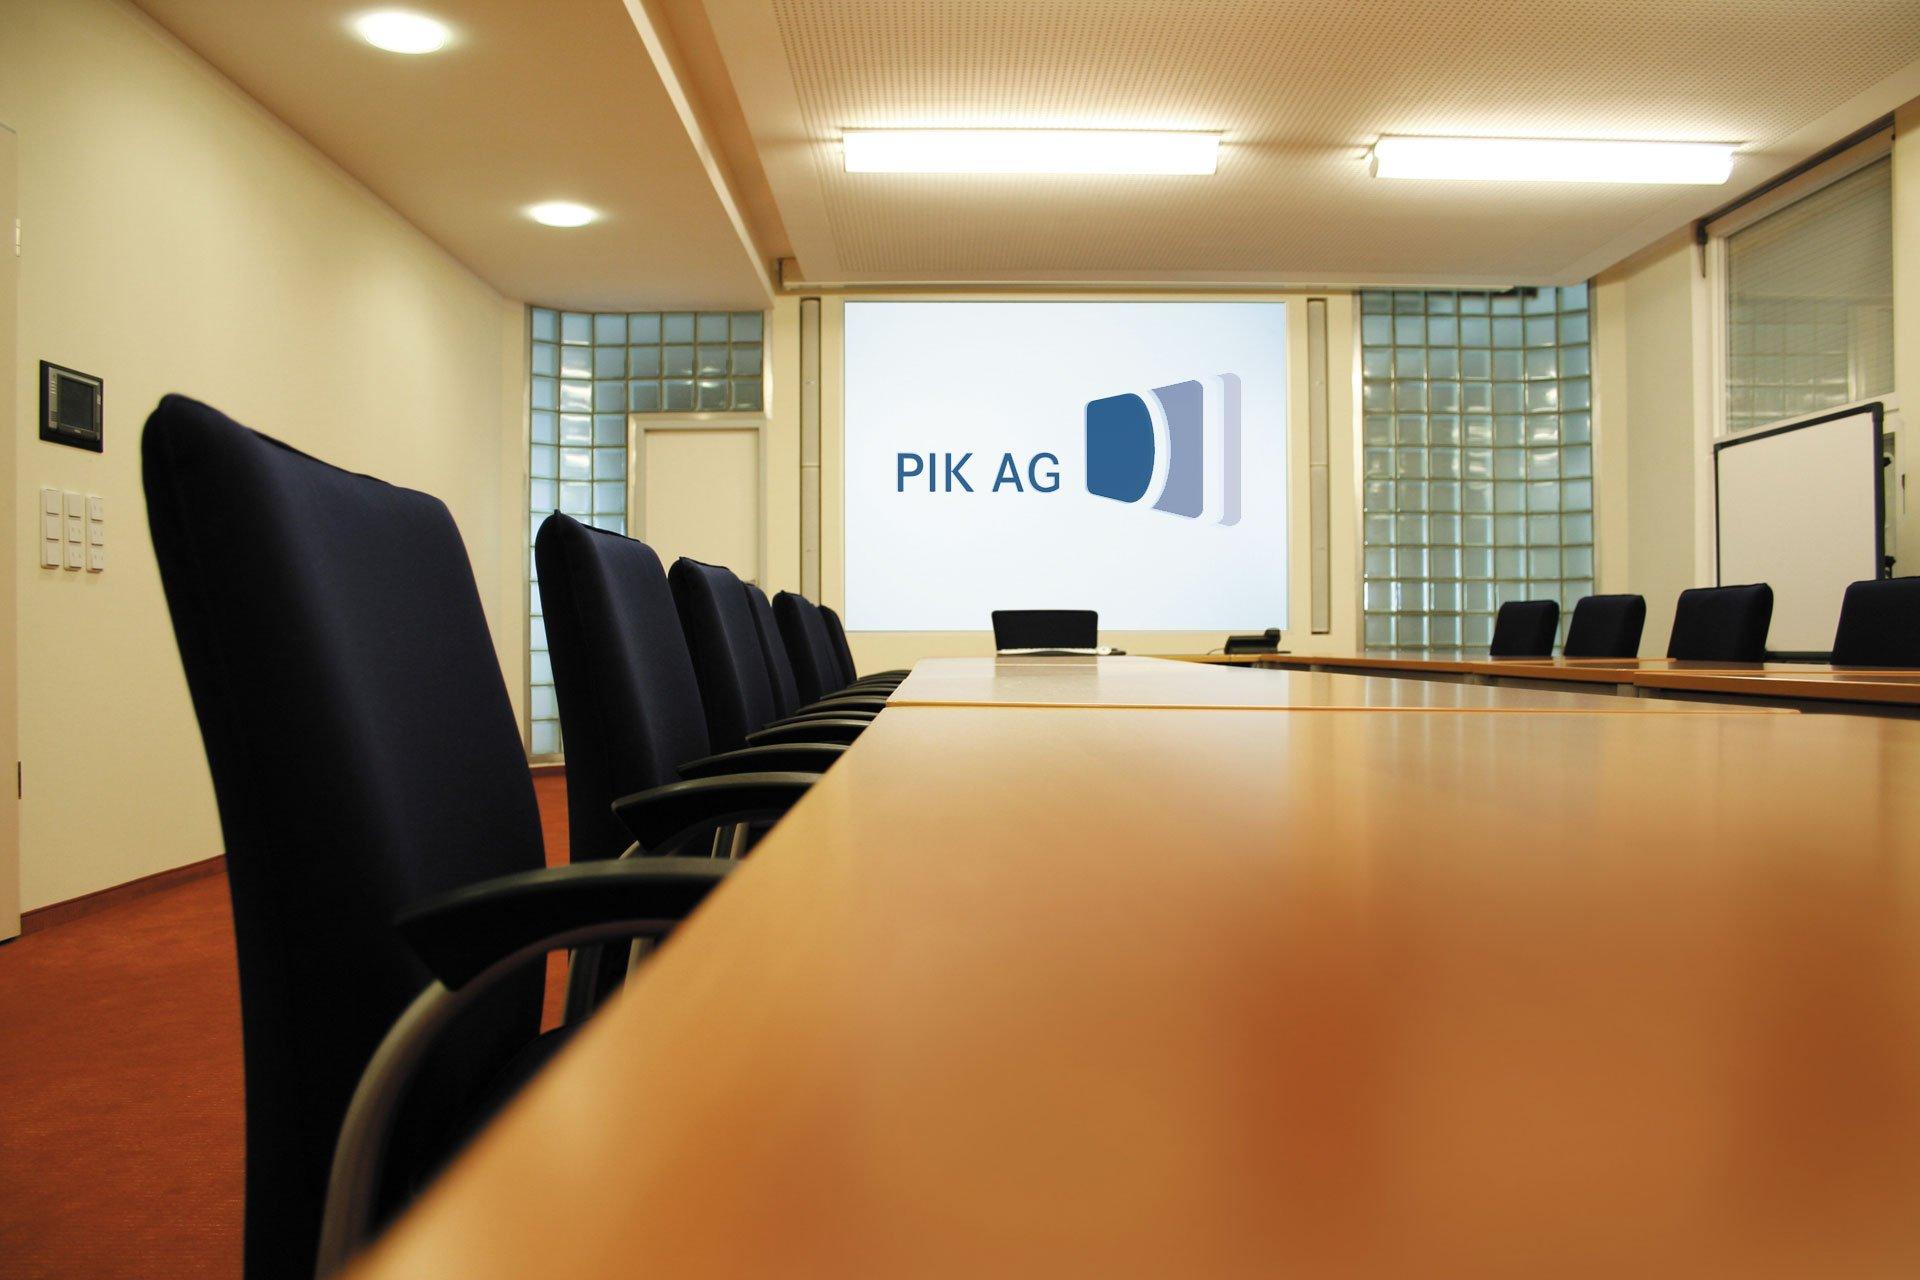 PIK AG Konferenzraum